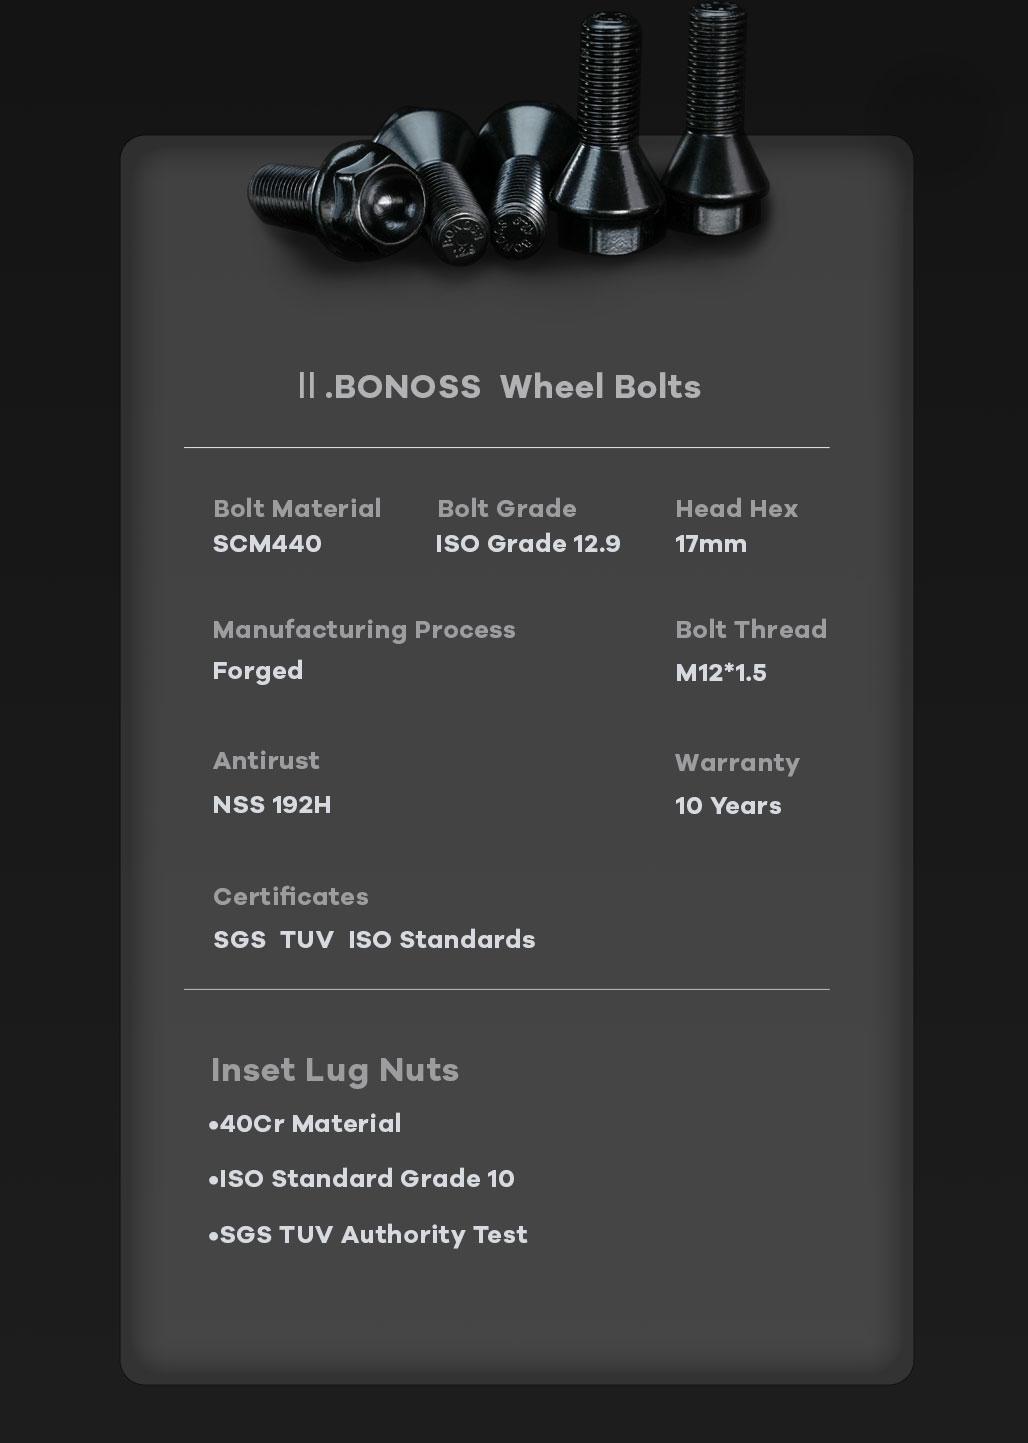 BONOSS-forged-active-cooling-5-Lug-wheel-spacers-(custom-wheel-spacers)-M12x1.5-by-lulu-10